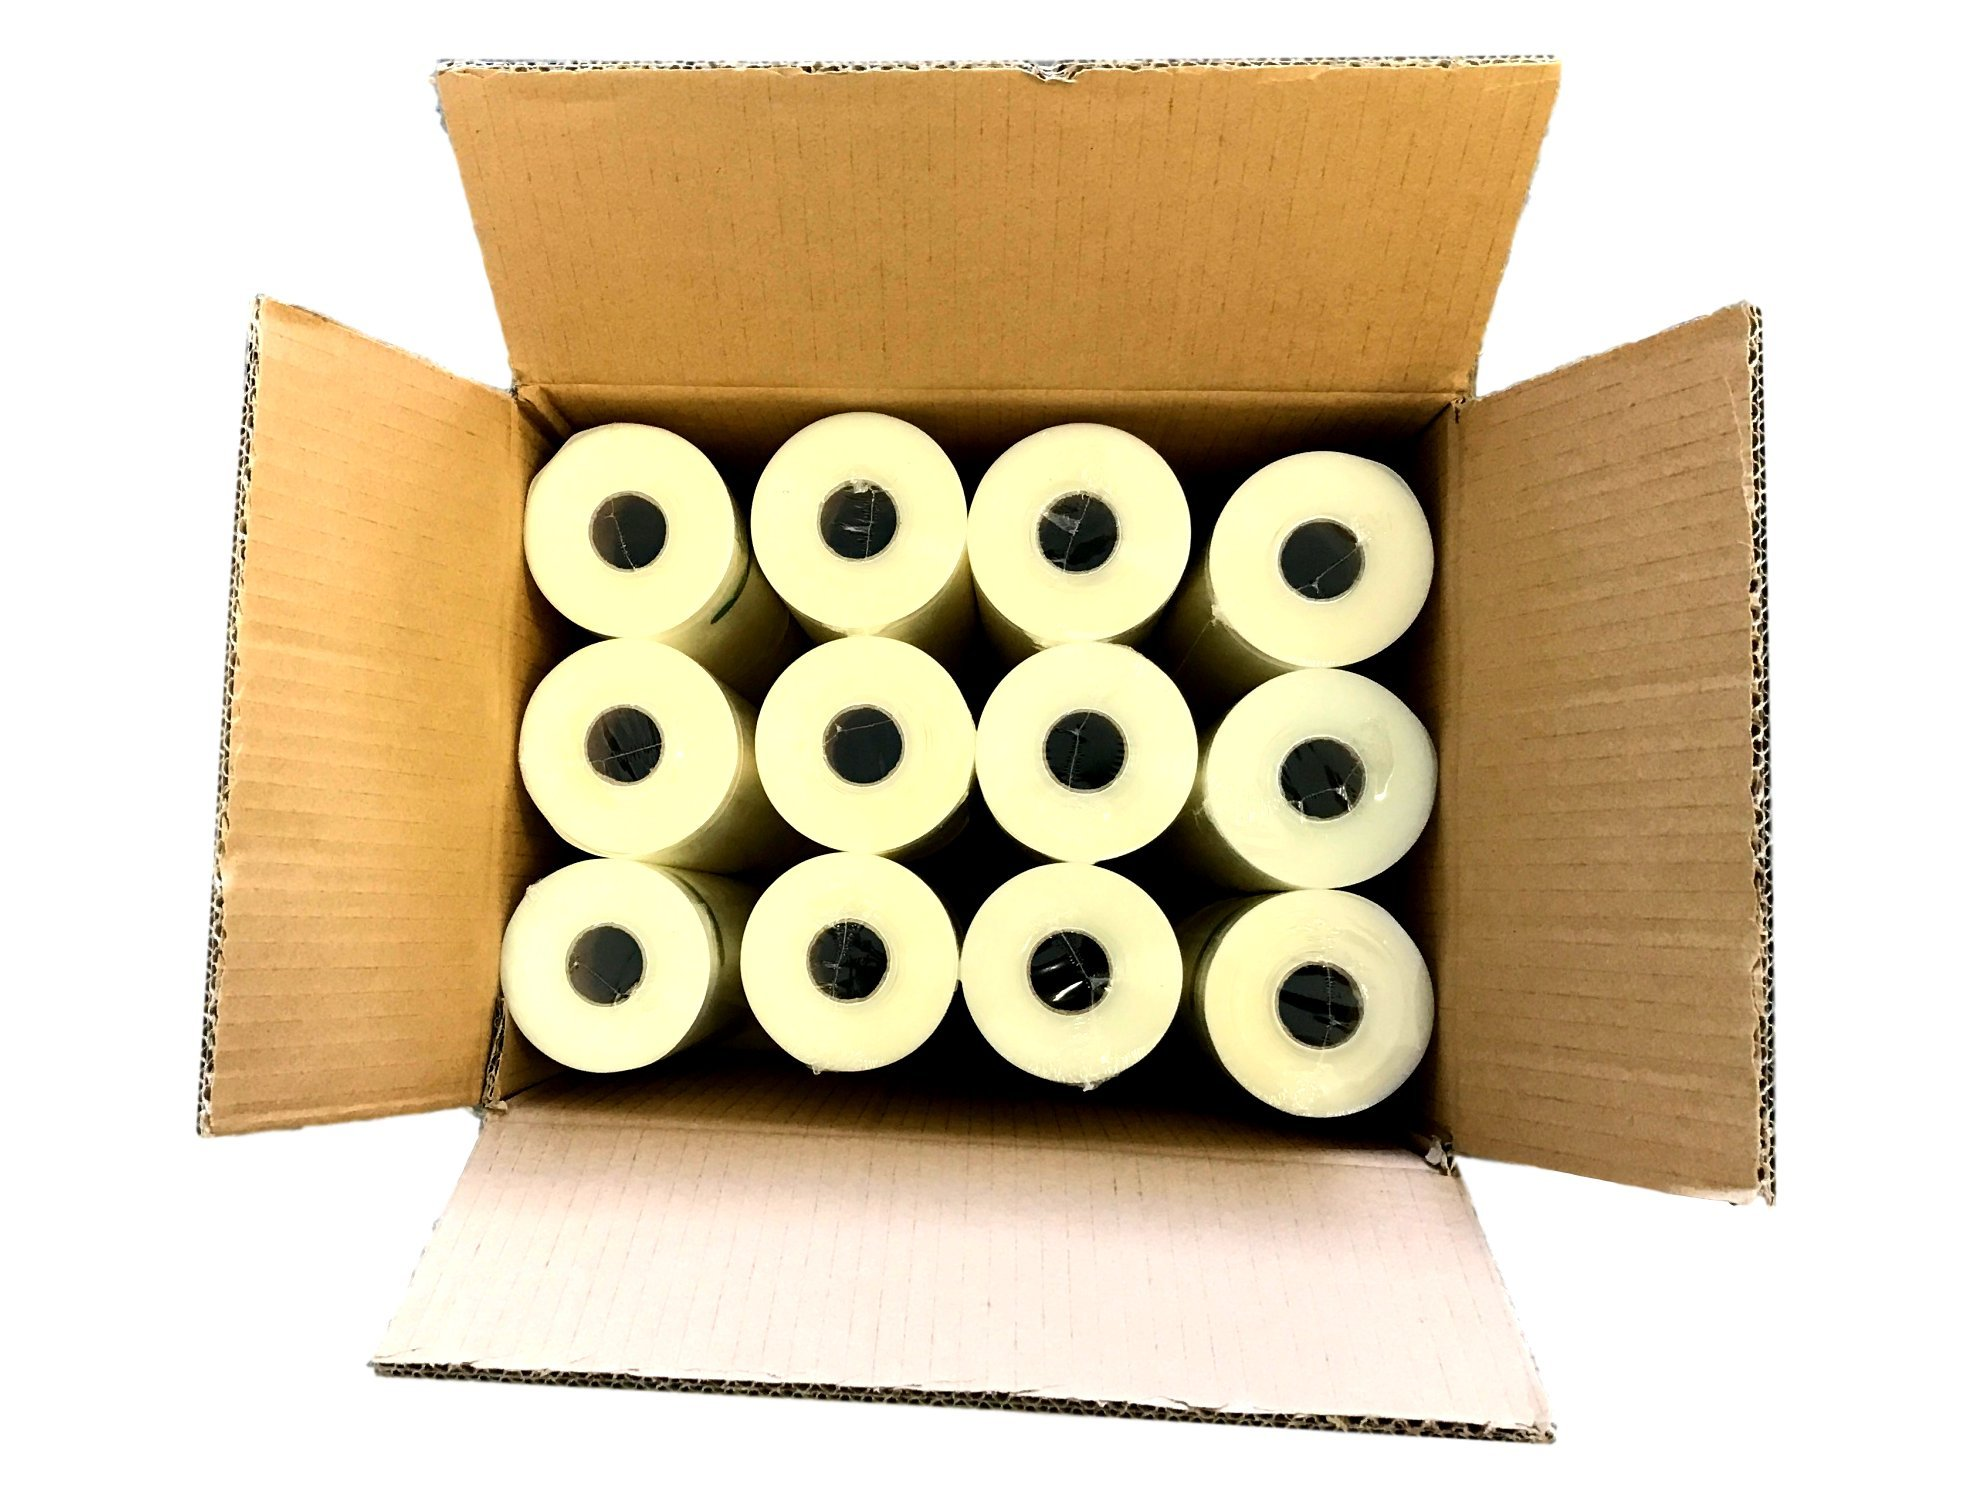 Vac-Fresh 11'' x 50' Vacuum Seal Bags for Vacuum Sealers VF1150C 3.5mil, Full Case of 12 Rolls